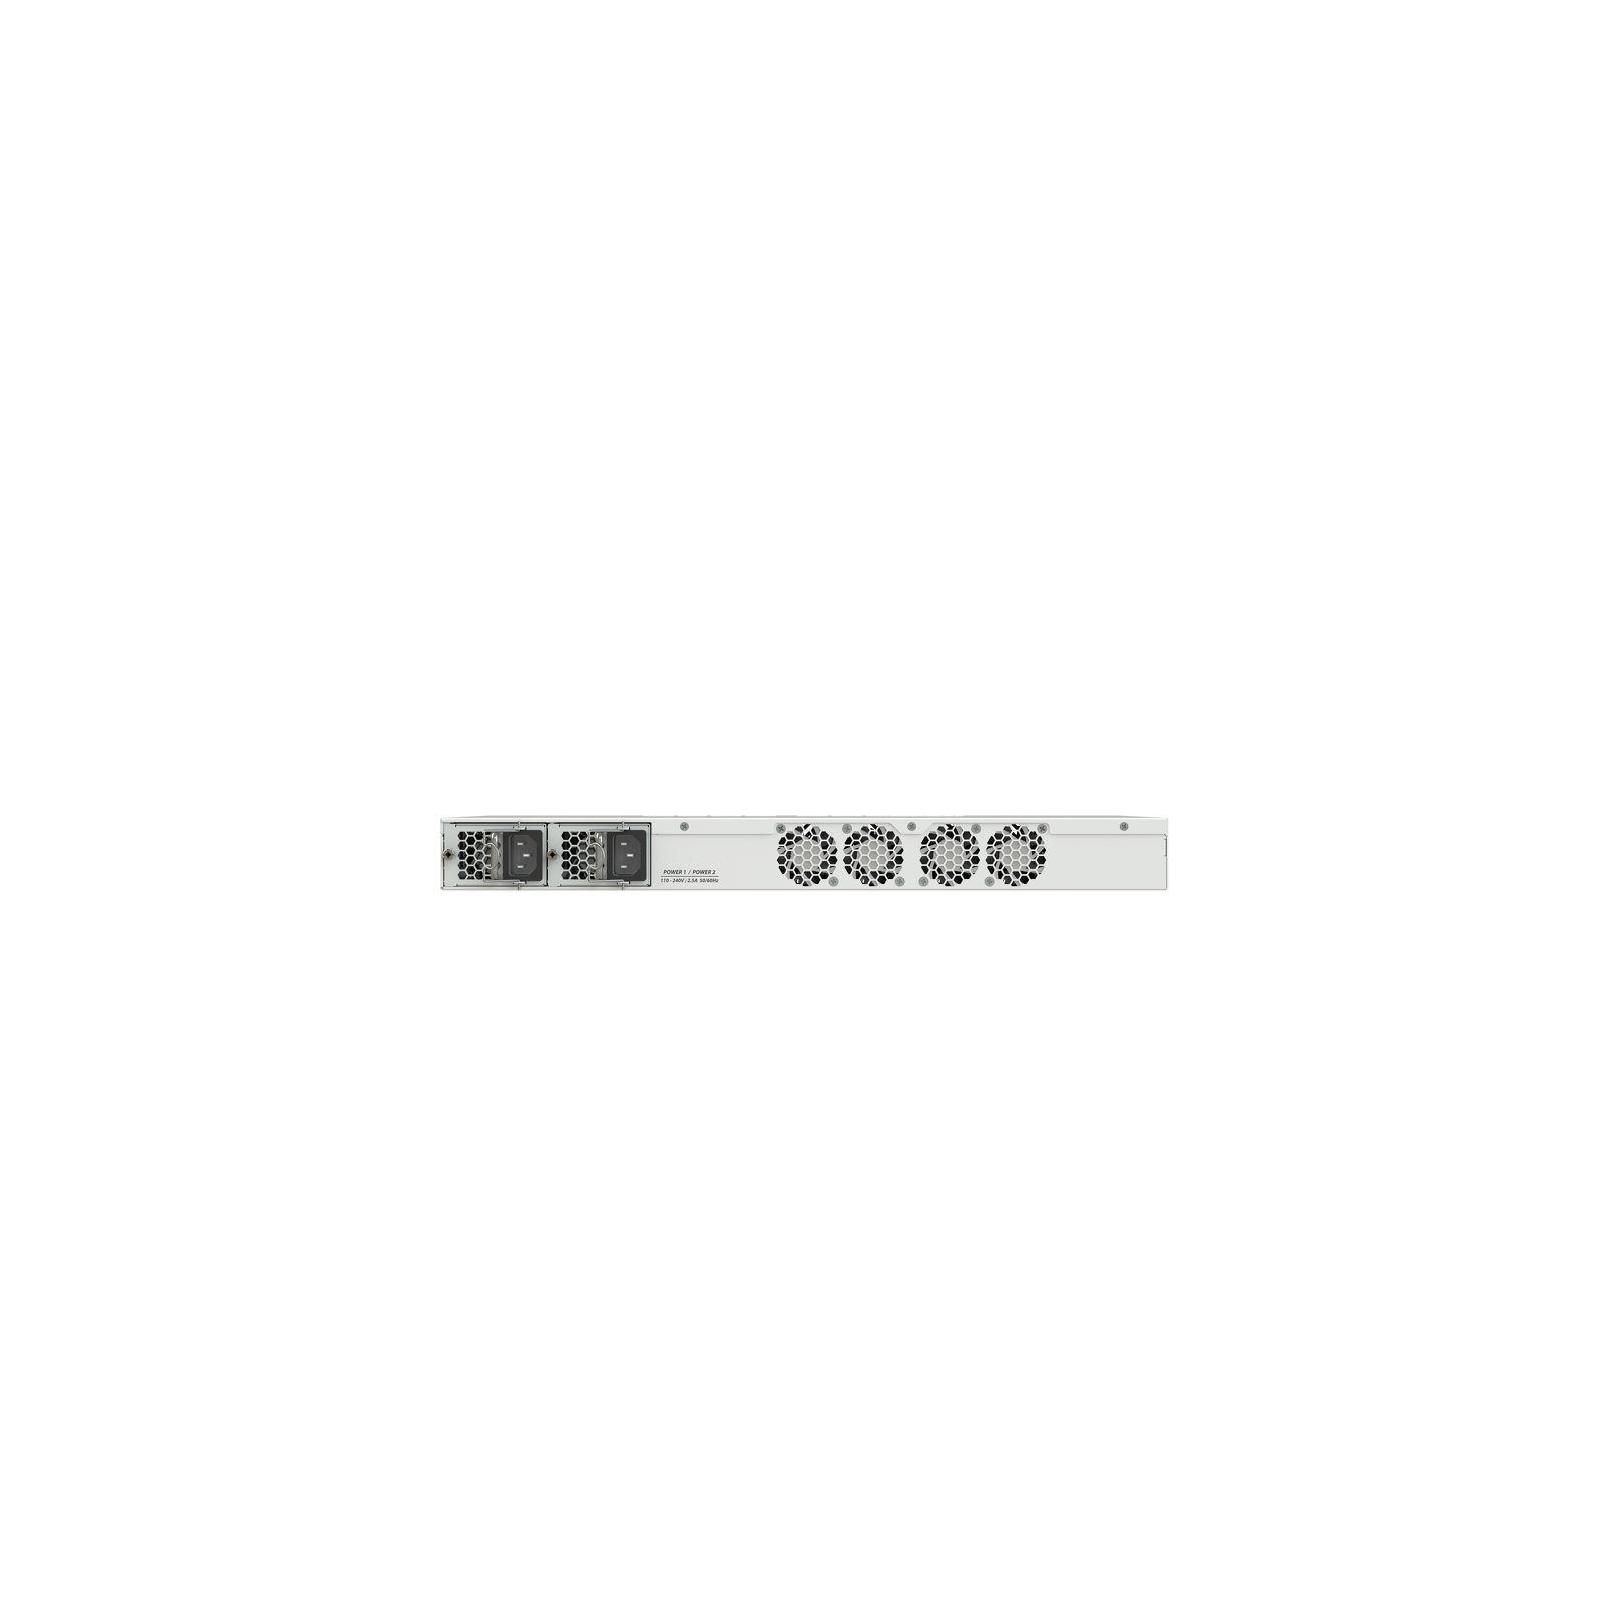 Маршрутизатор Mikrotik CCR1072-1G-8S+ изображение 2